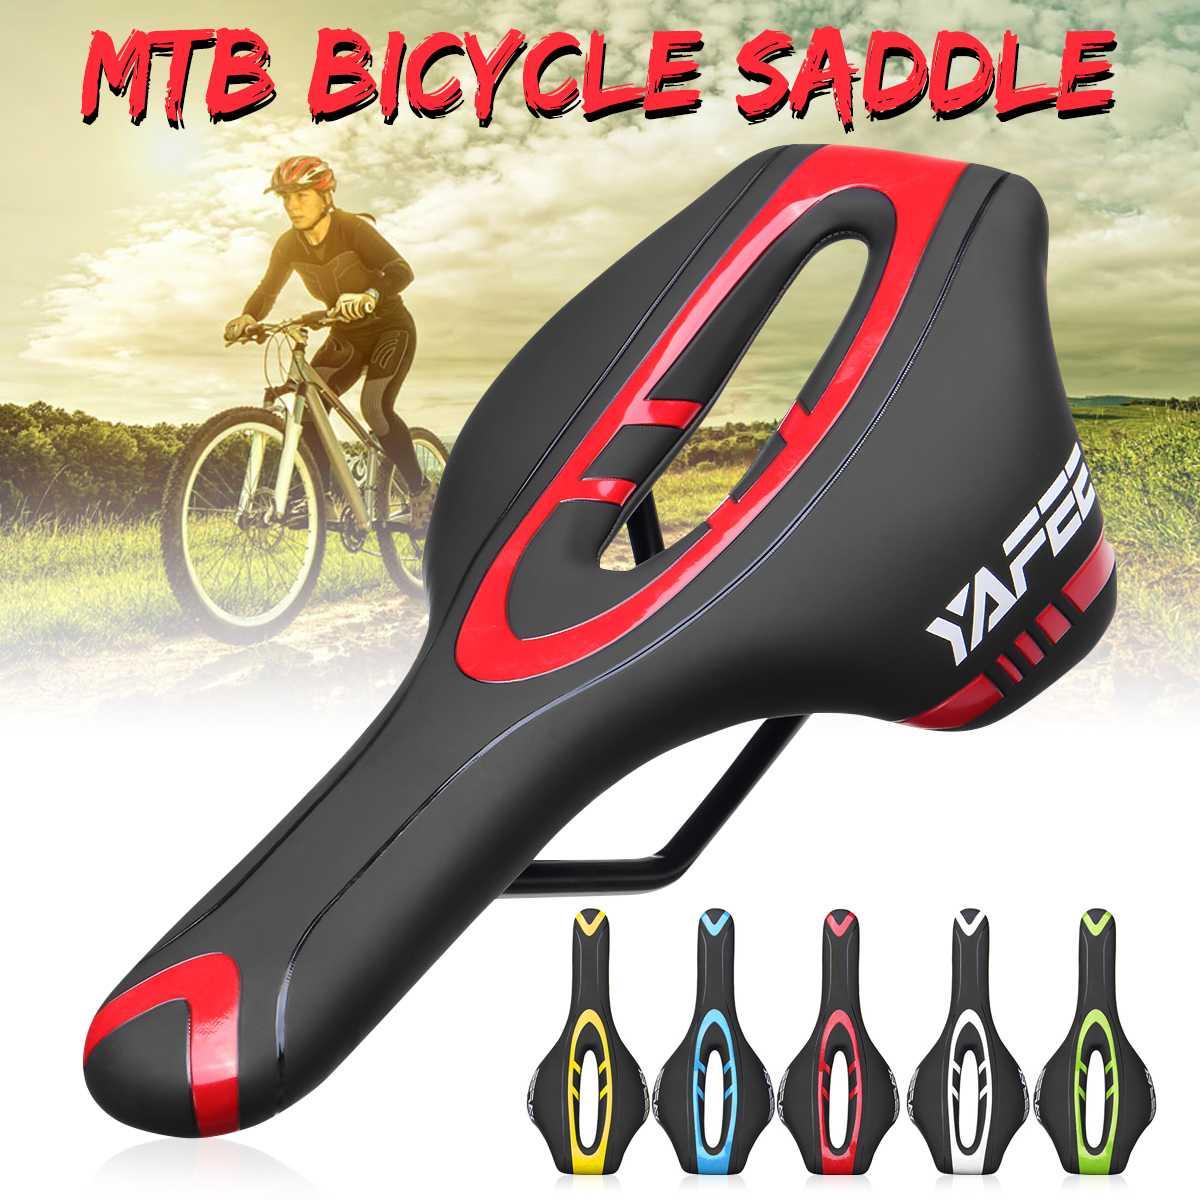 ROCKBROS Cycling Bicycle Saddle Black Road Bike MTB Saddle Steel Rail Rear Seat